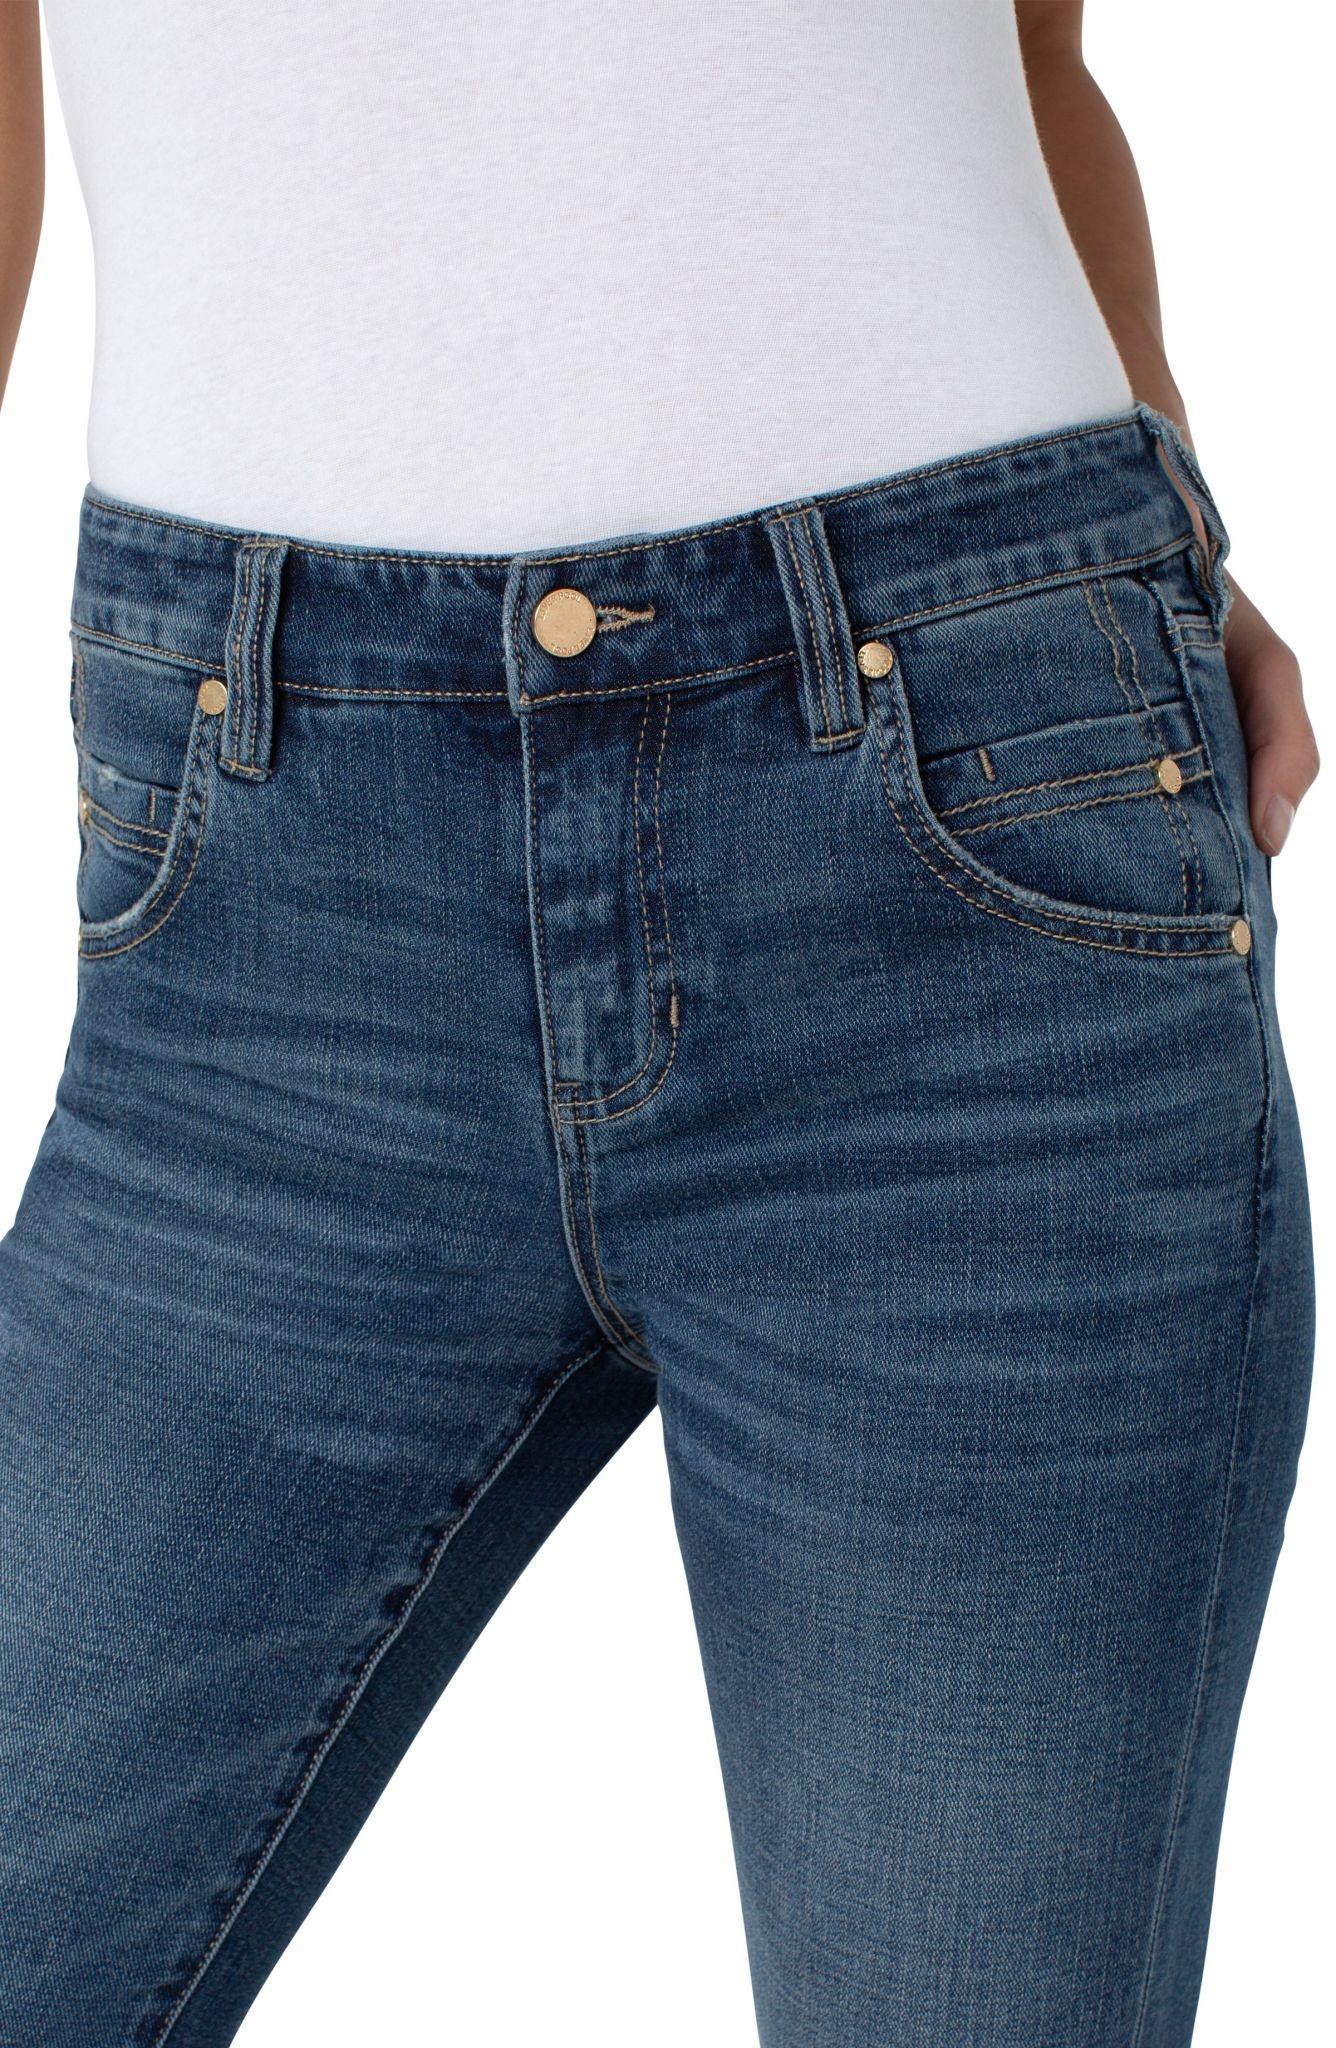 Scoop Pocket Kick Flair